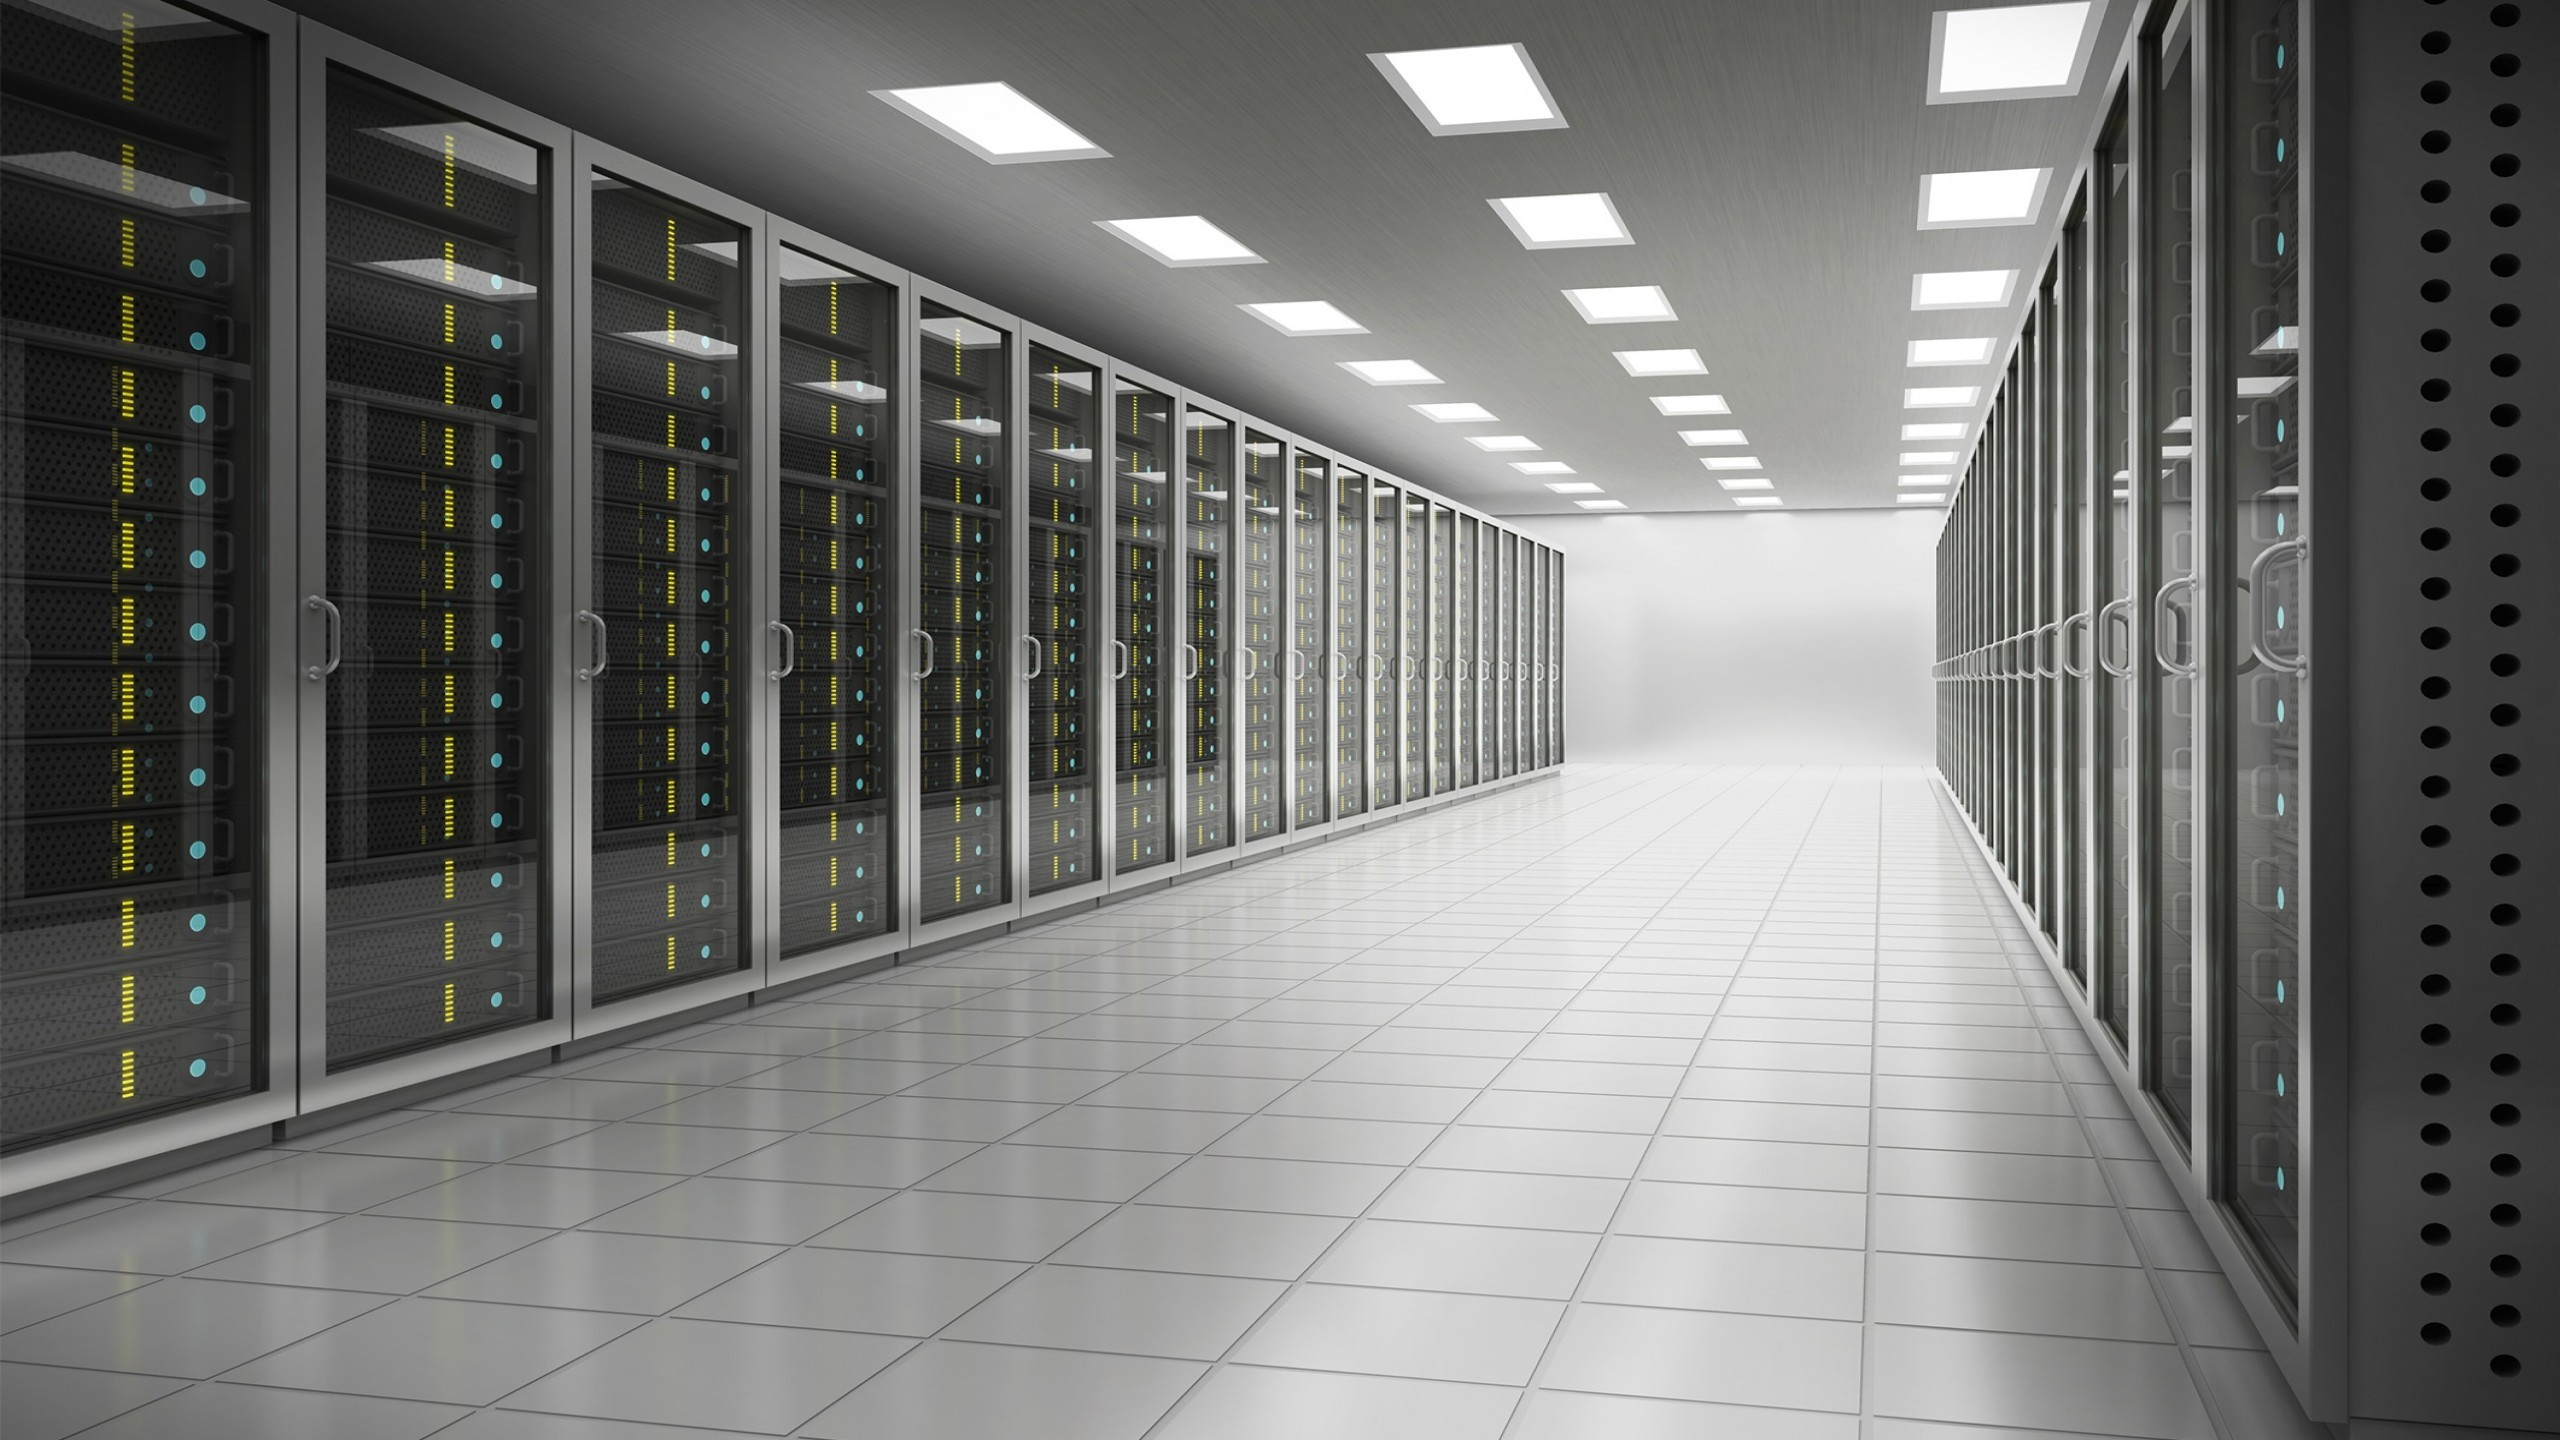 General 2560x1440 server lights glass tiles technology Hi-Tech room architecture door operating system data center gray datacenter